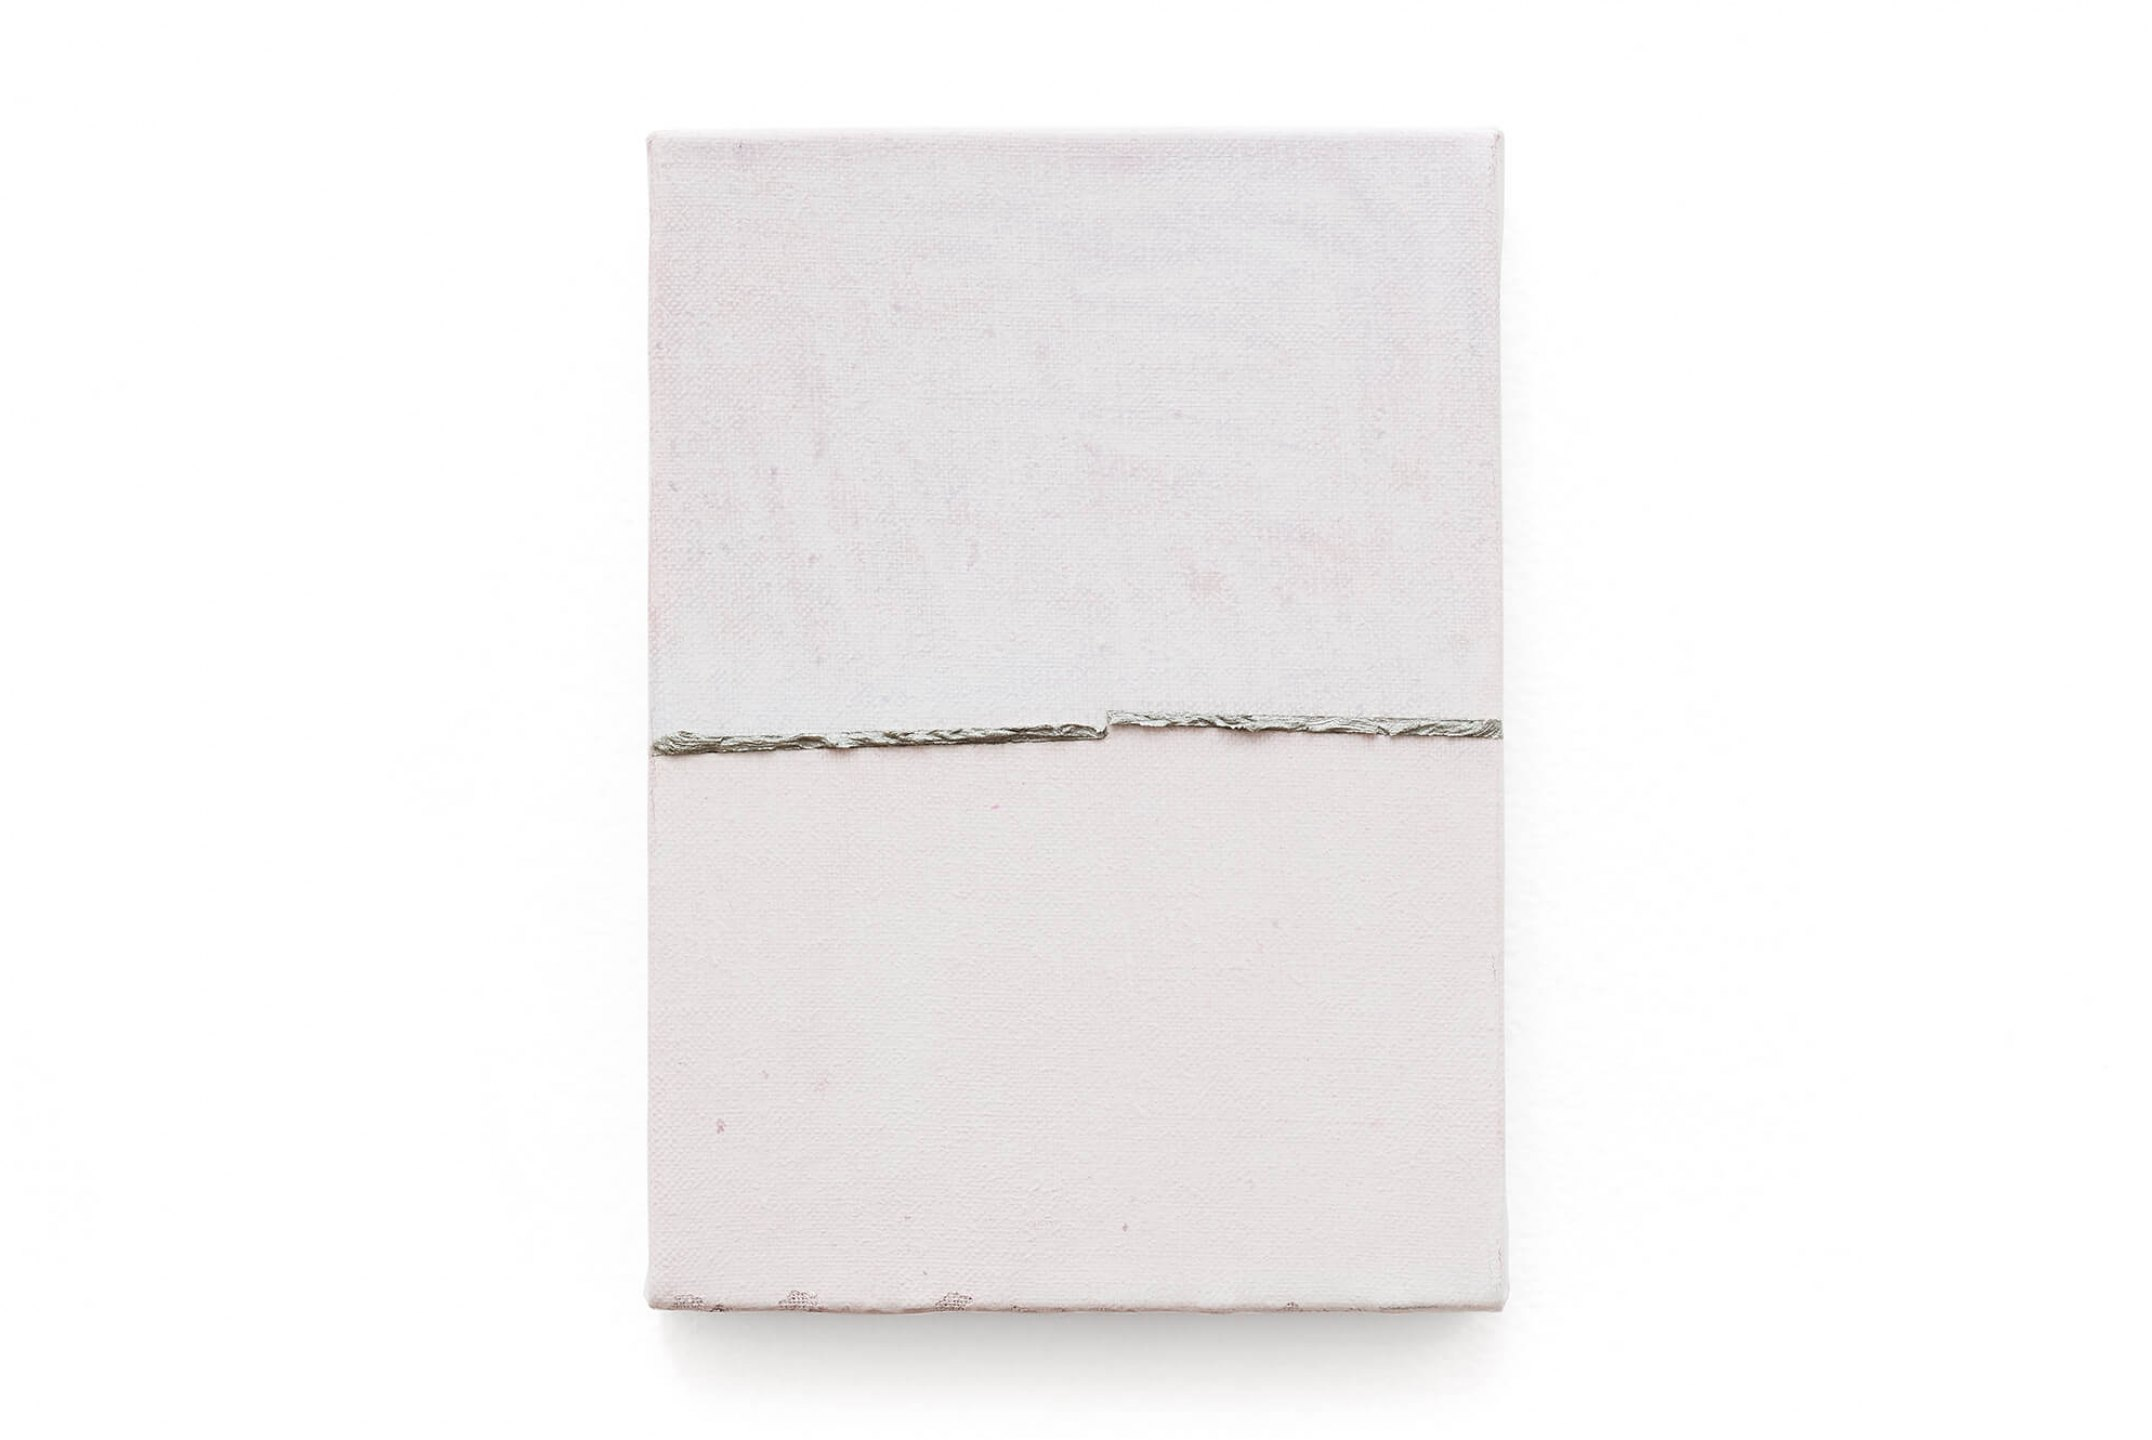 Paulo Monteiro, <em>untitled</em>, 2015, oil on canvas, 21 × 15,5 cm - Mendes Wood DM